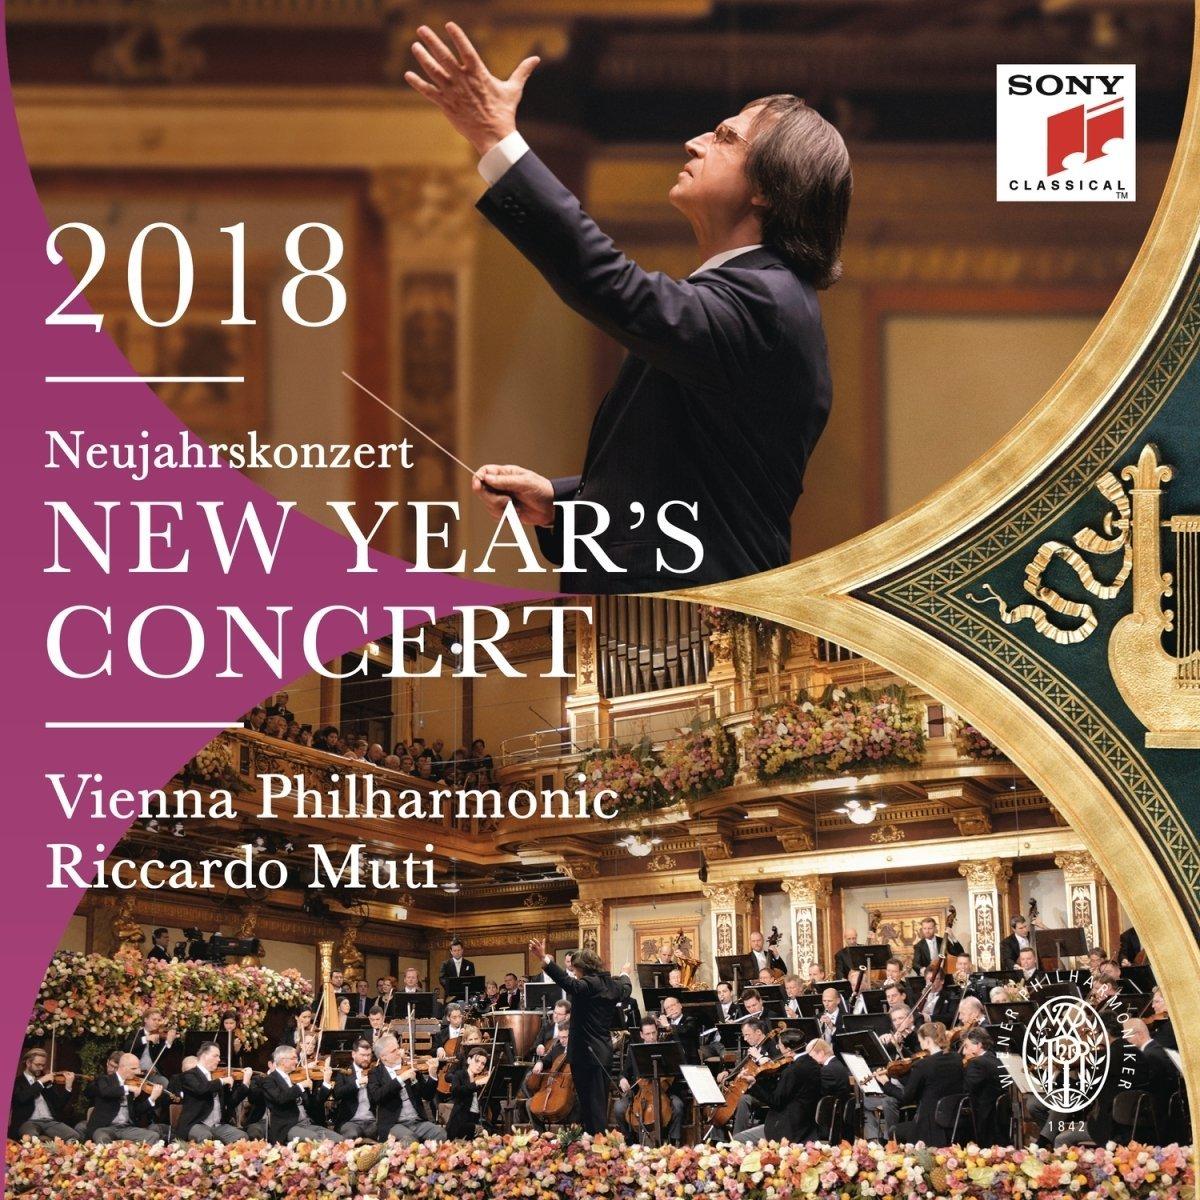 New Year's Day Concert 2018 - Riccardo Muti conduc